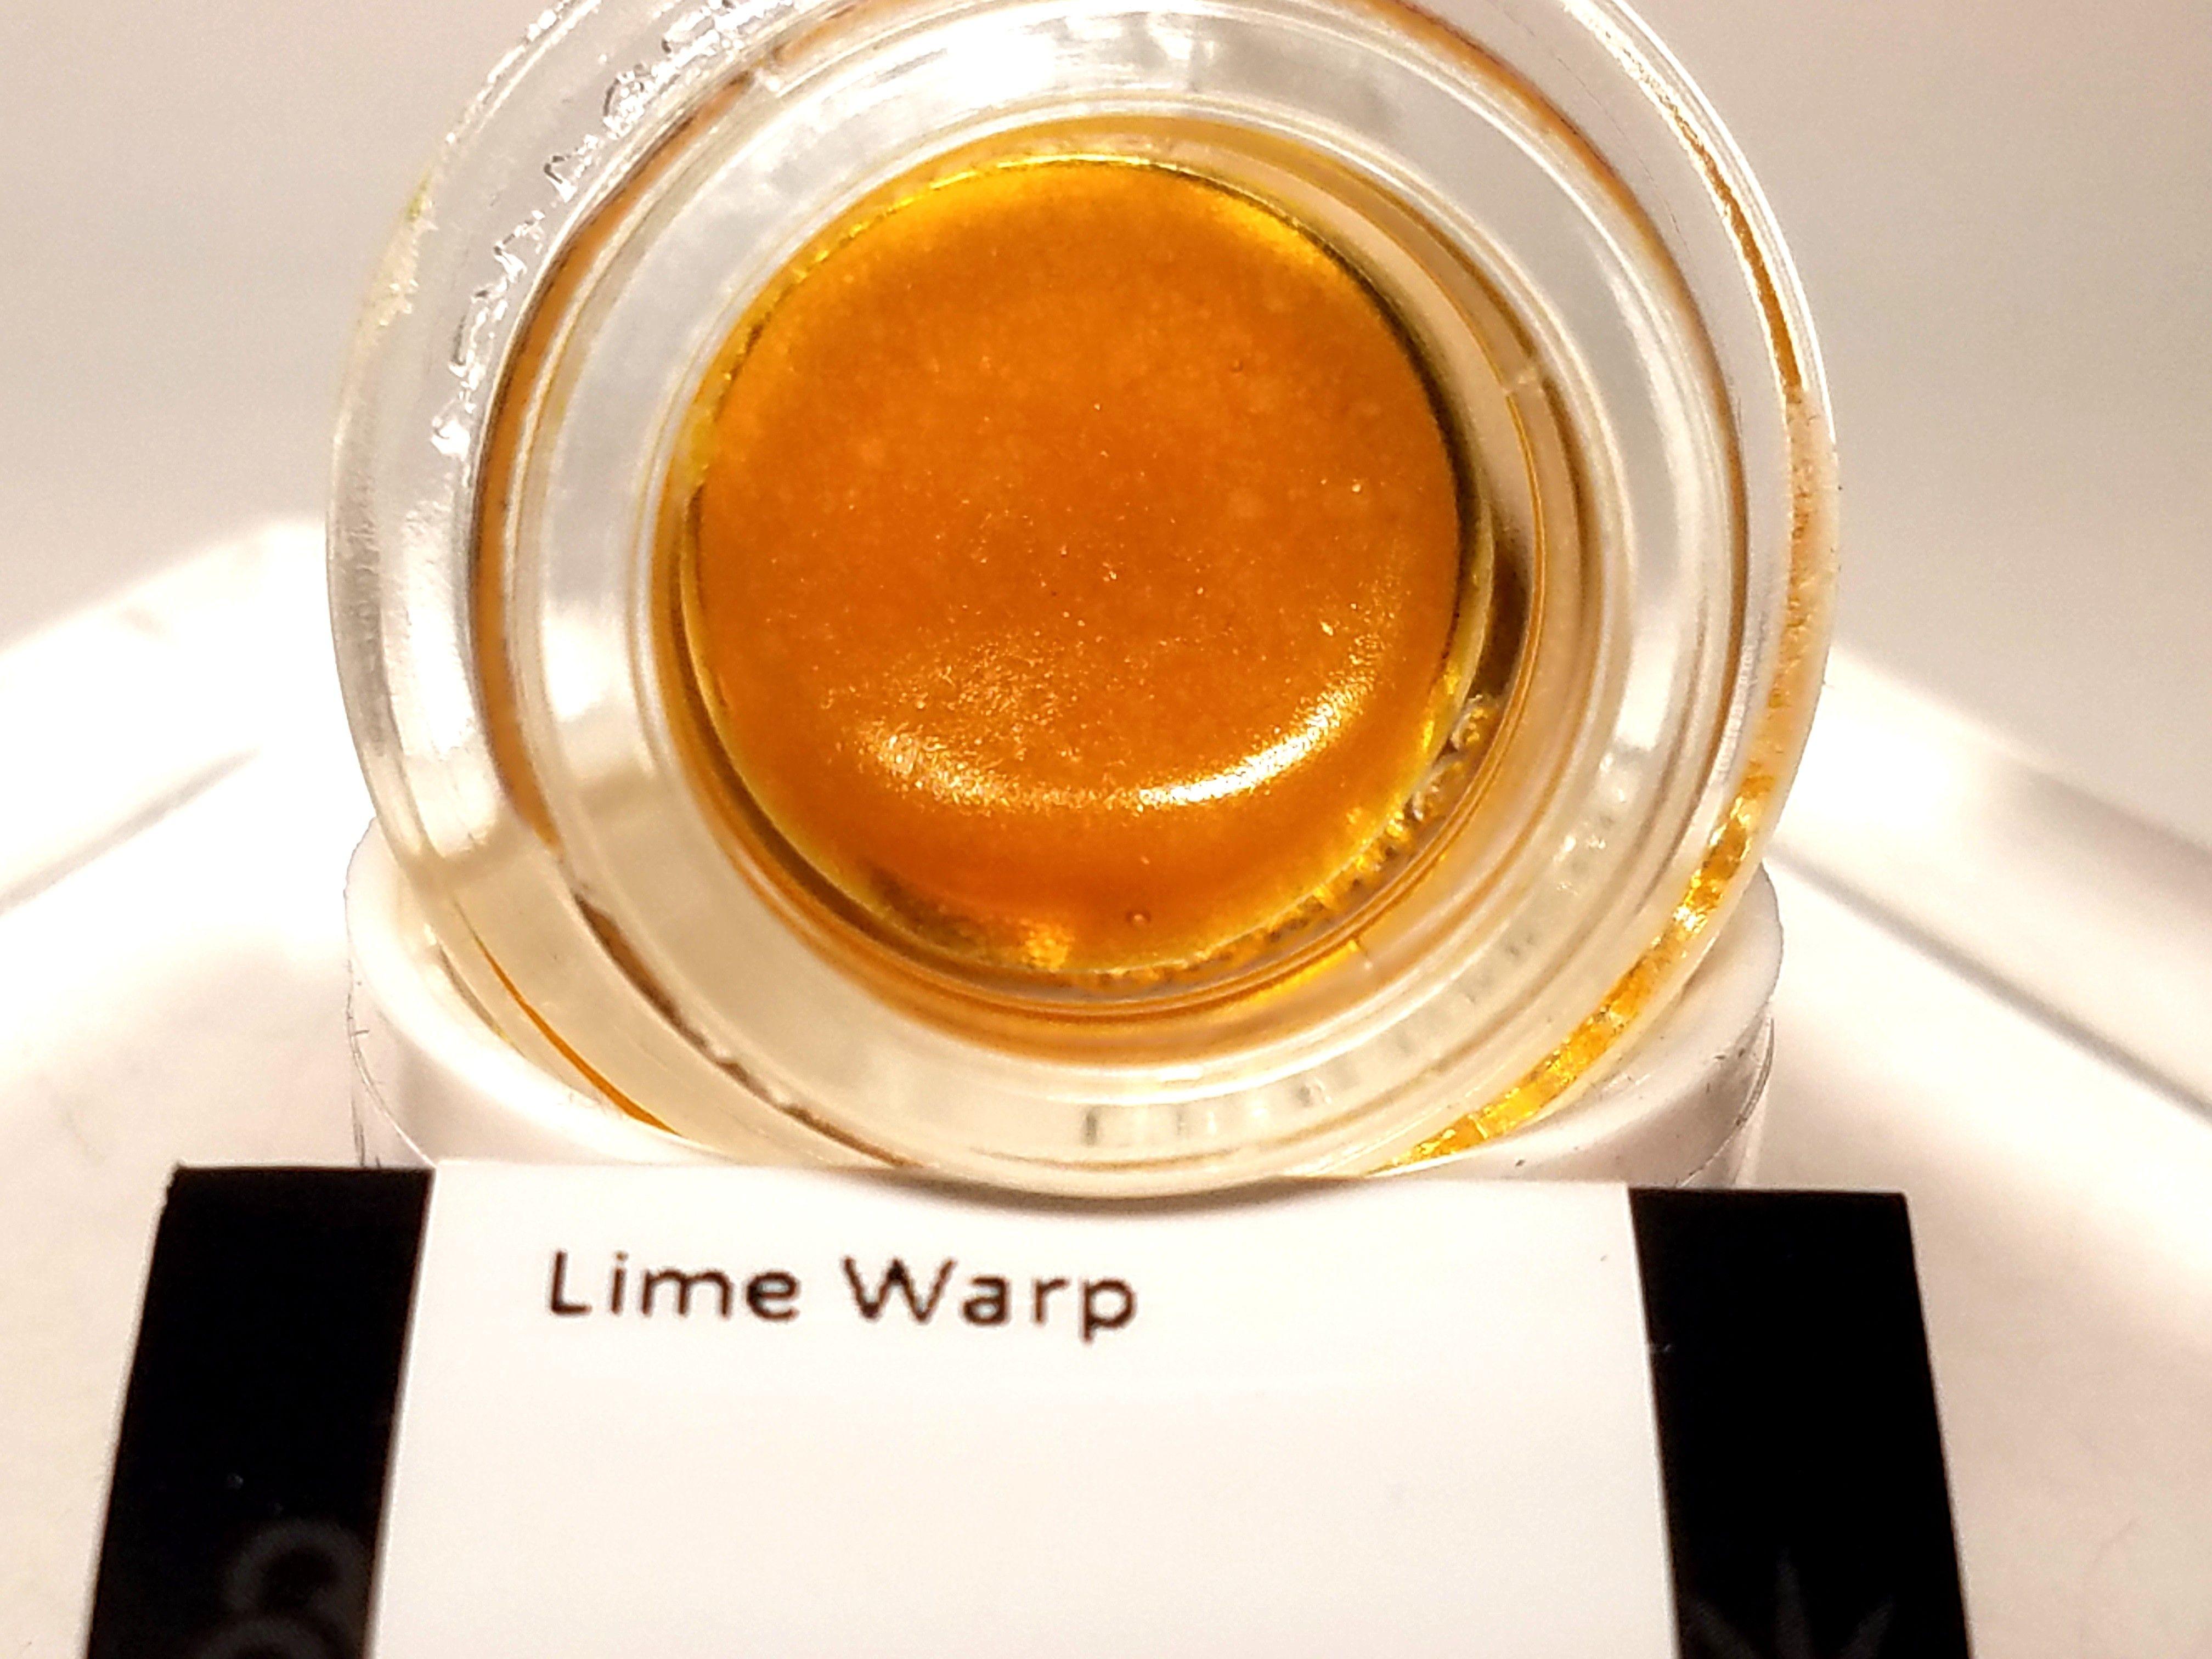 Bobsled - Lime Warp, Indica Hybrid, Live Resin